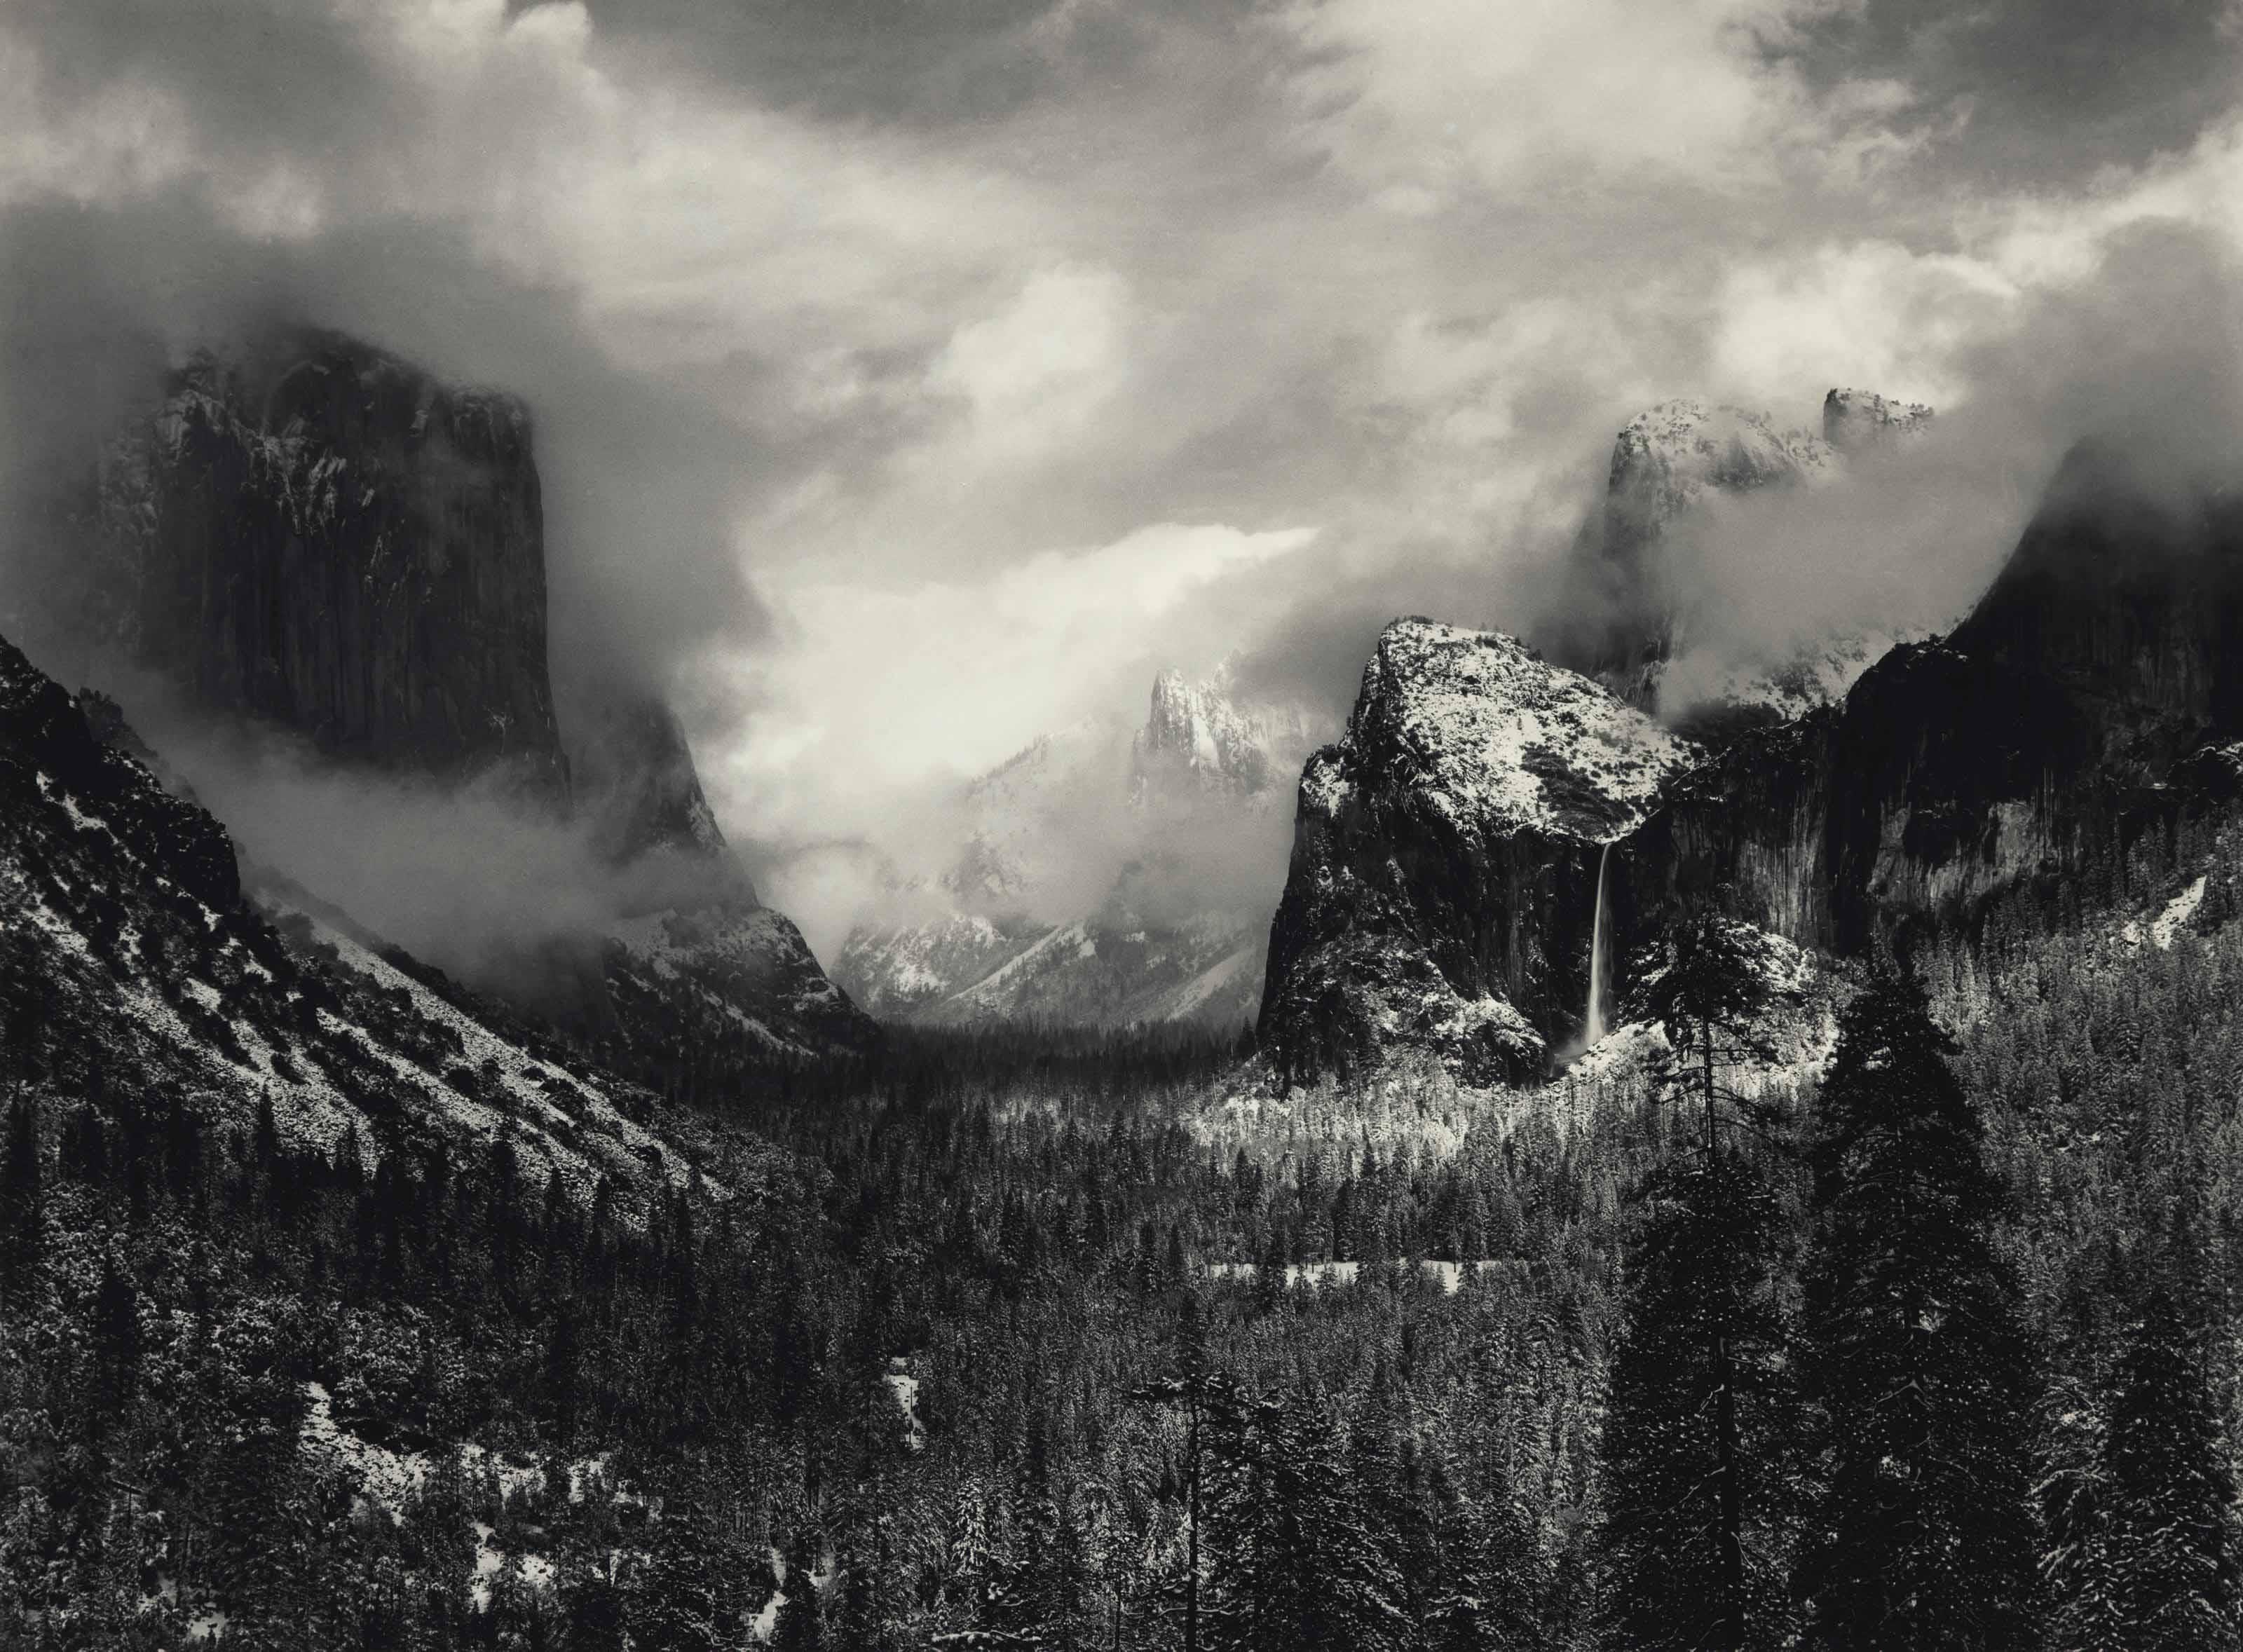 Clearing Winter Storm, Yosemite National Park, California, 1938